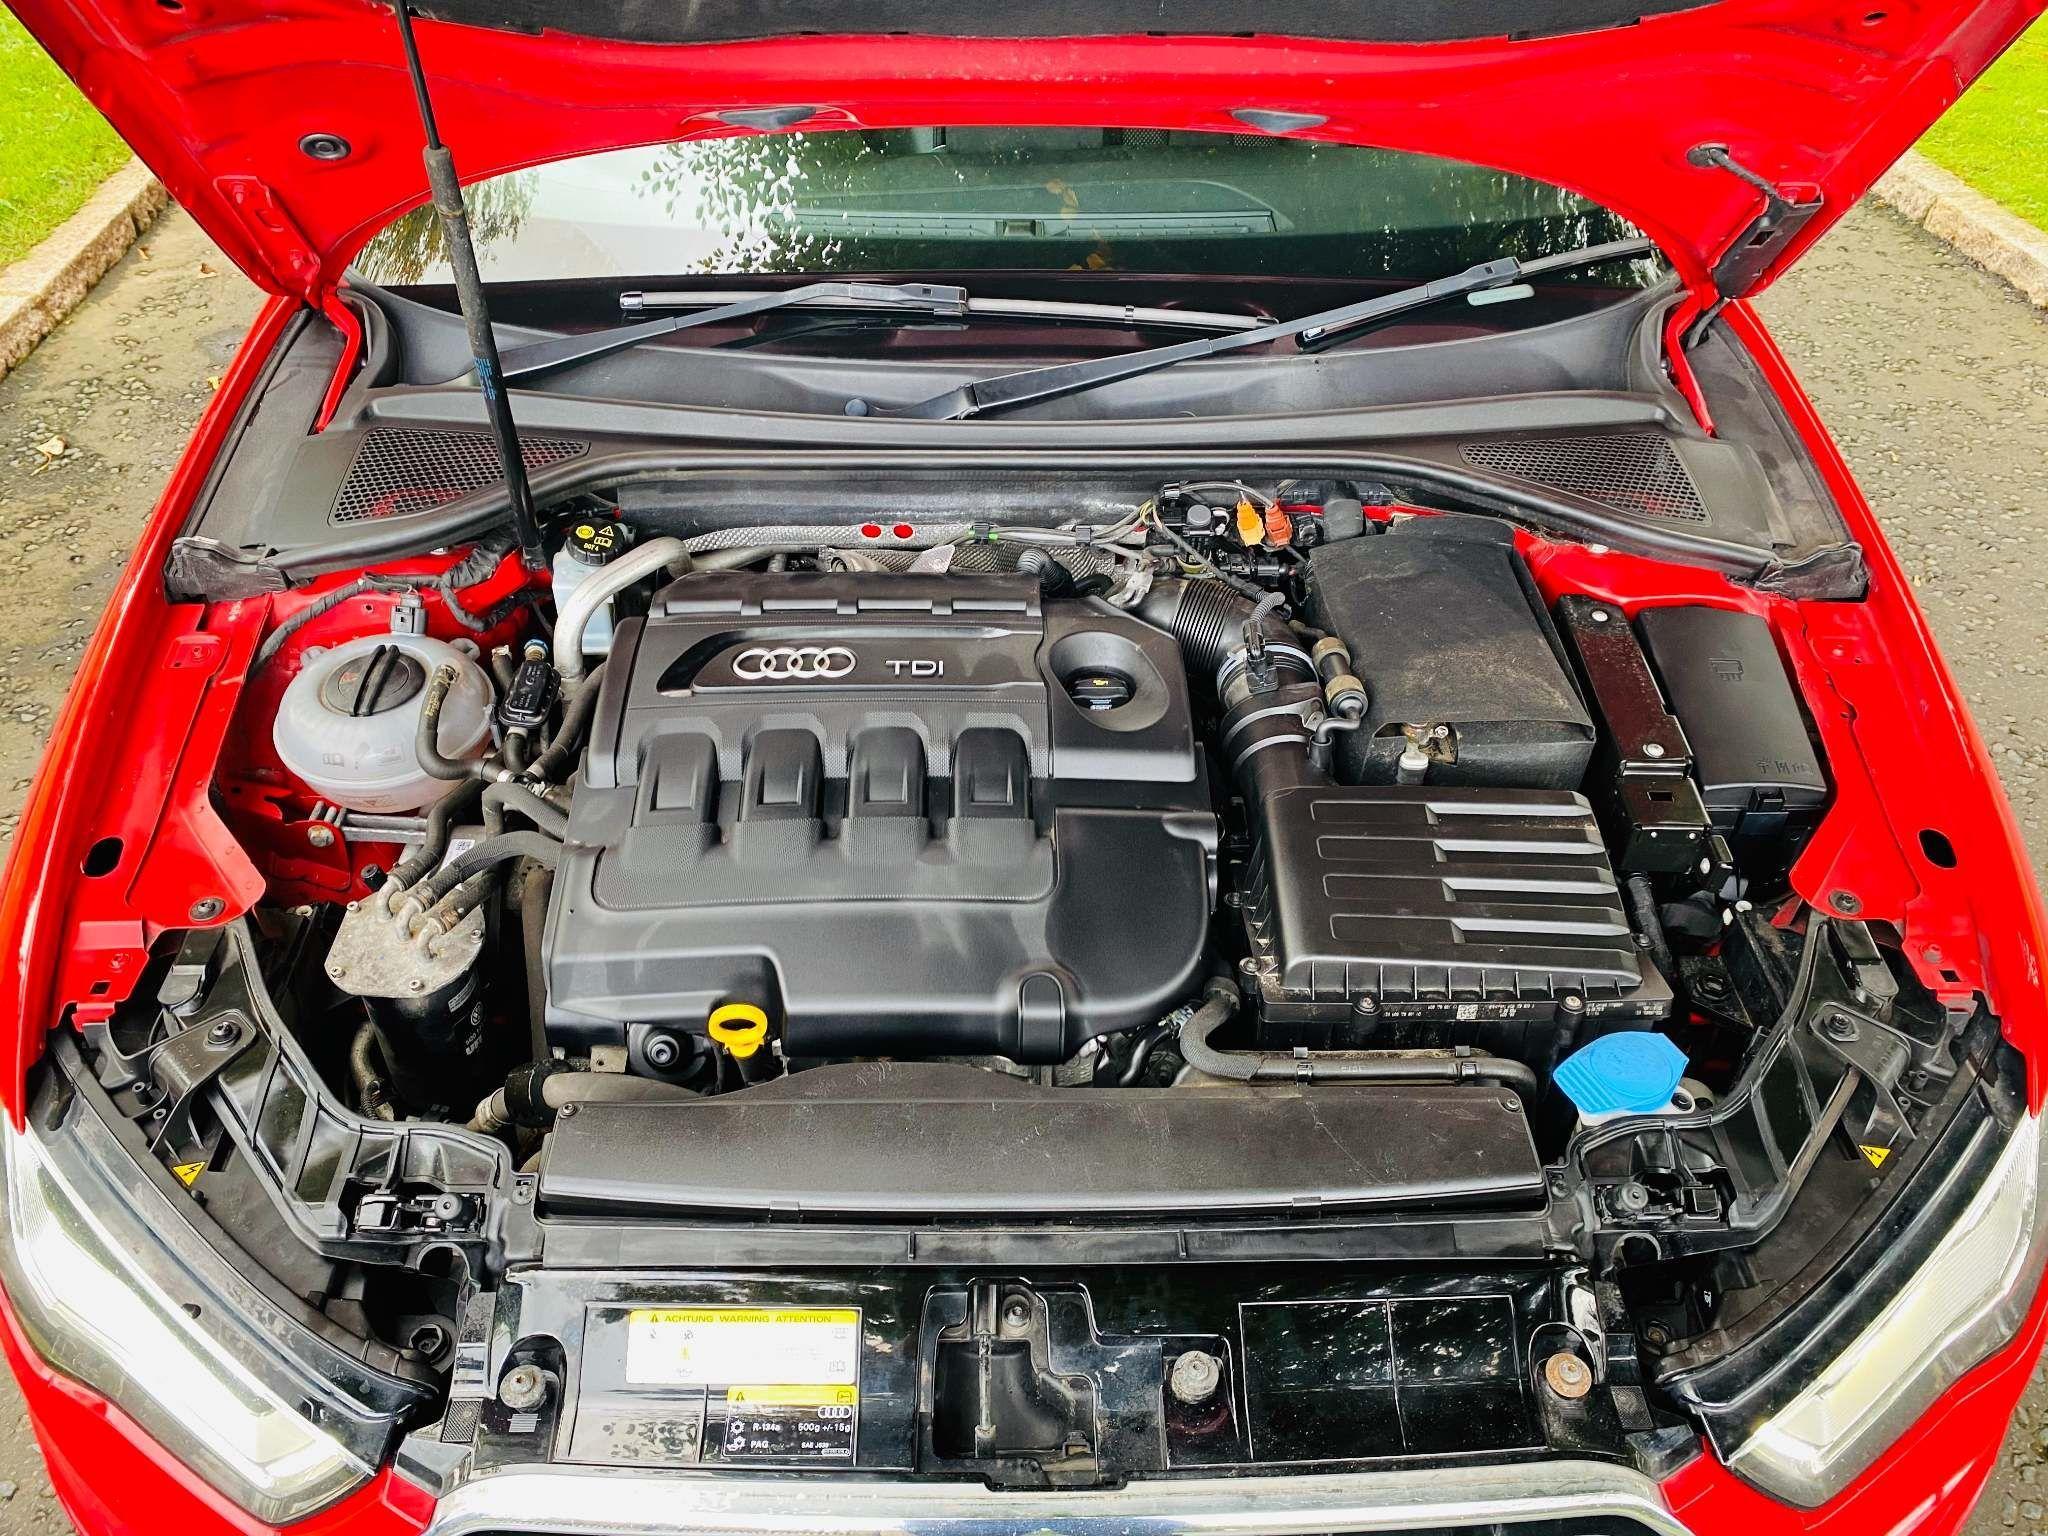 2013 Audi A3 2.0 TDI S line Sportback 5dr Diesel Manual – Moyway Motors Dungannon full